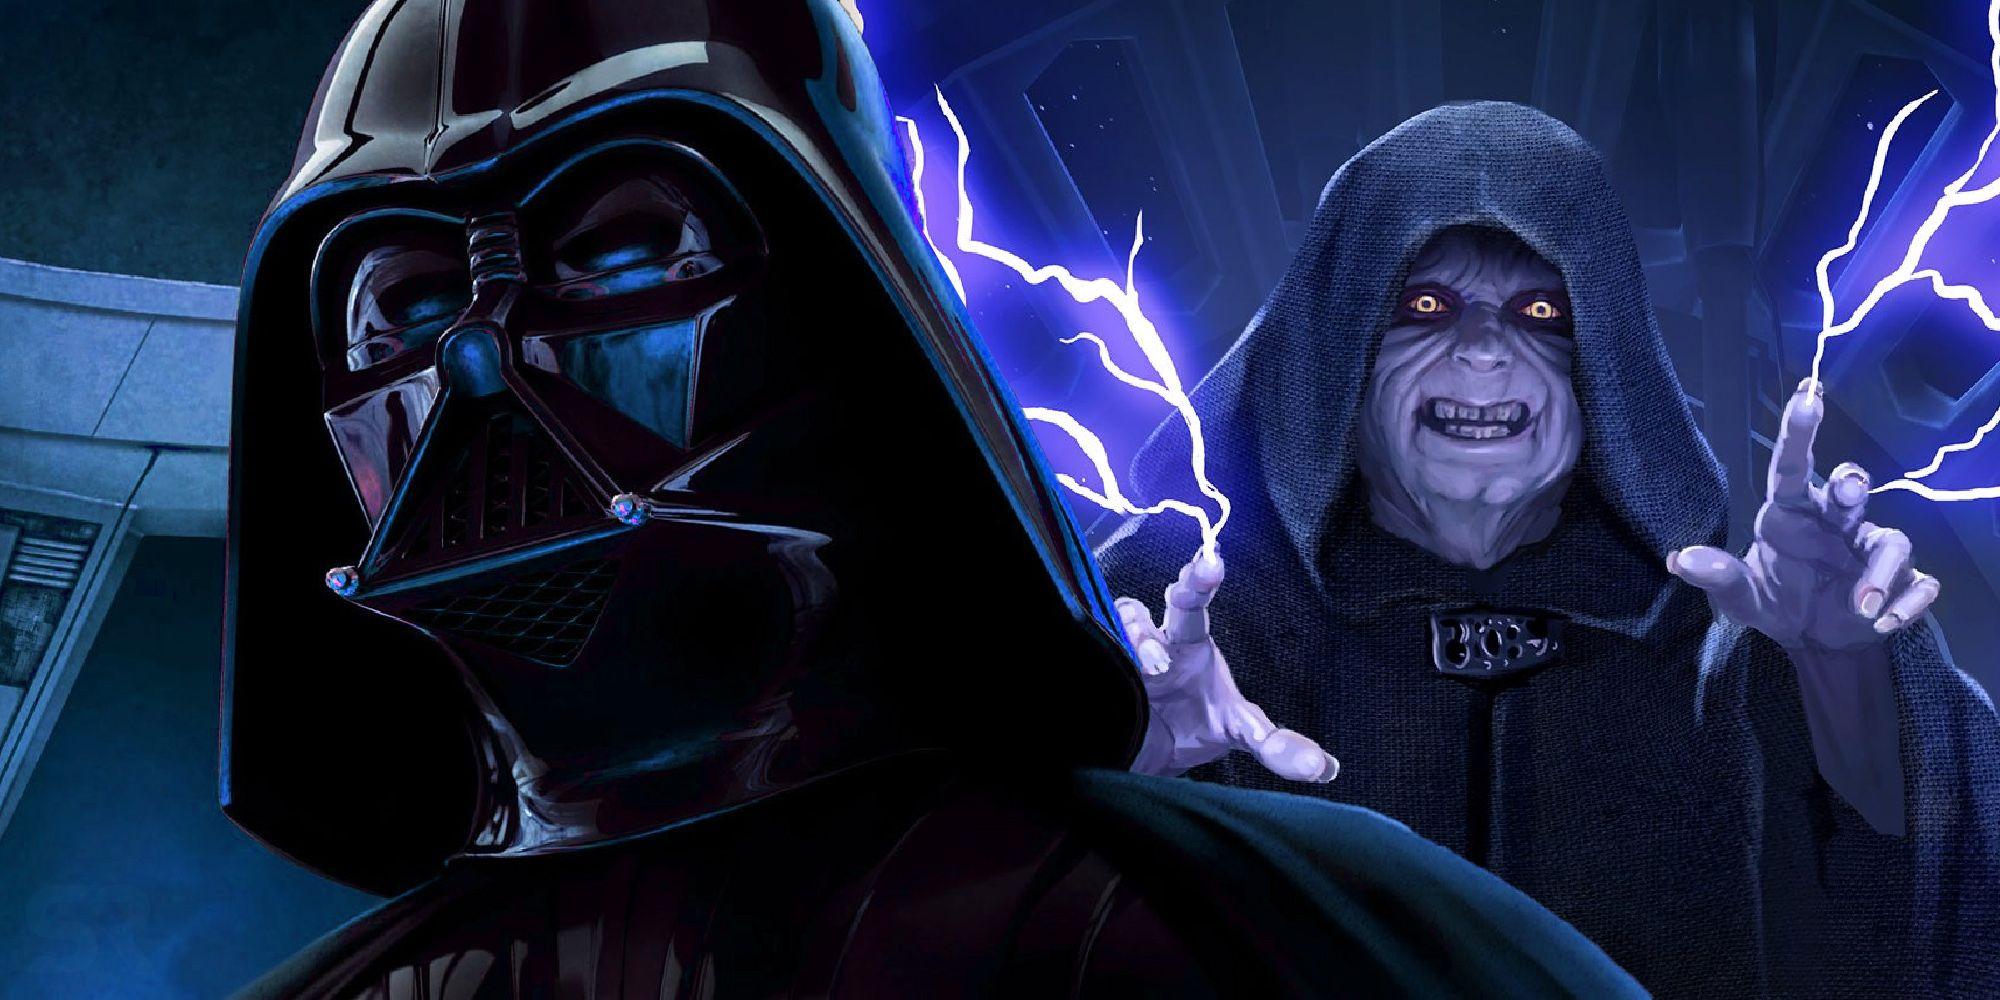 Banner for Darth Vader's MC Server server